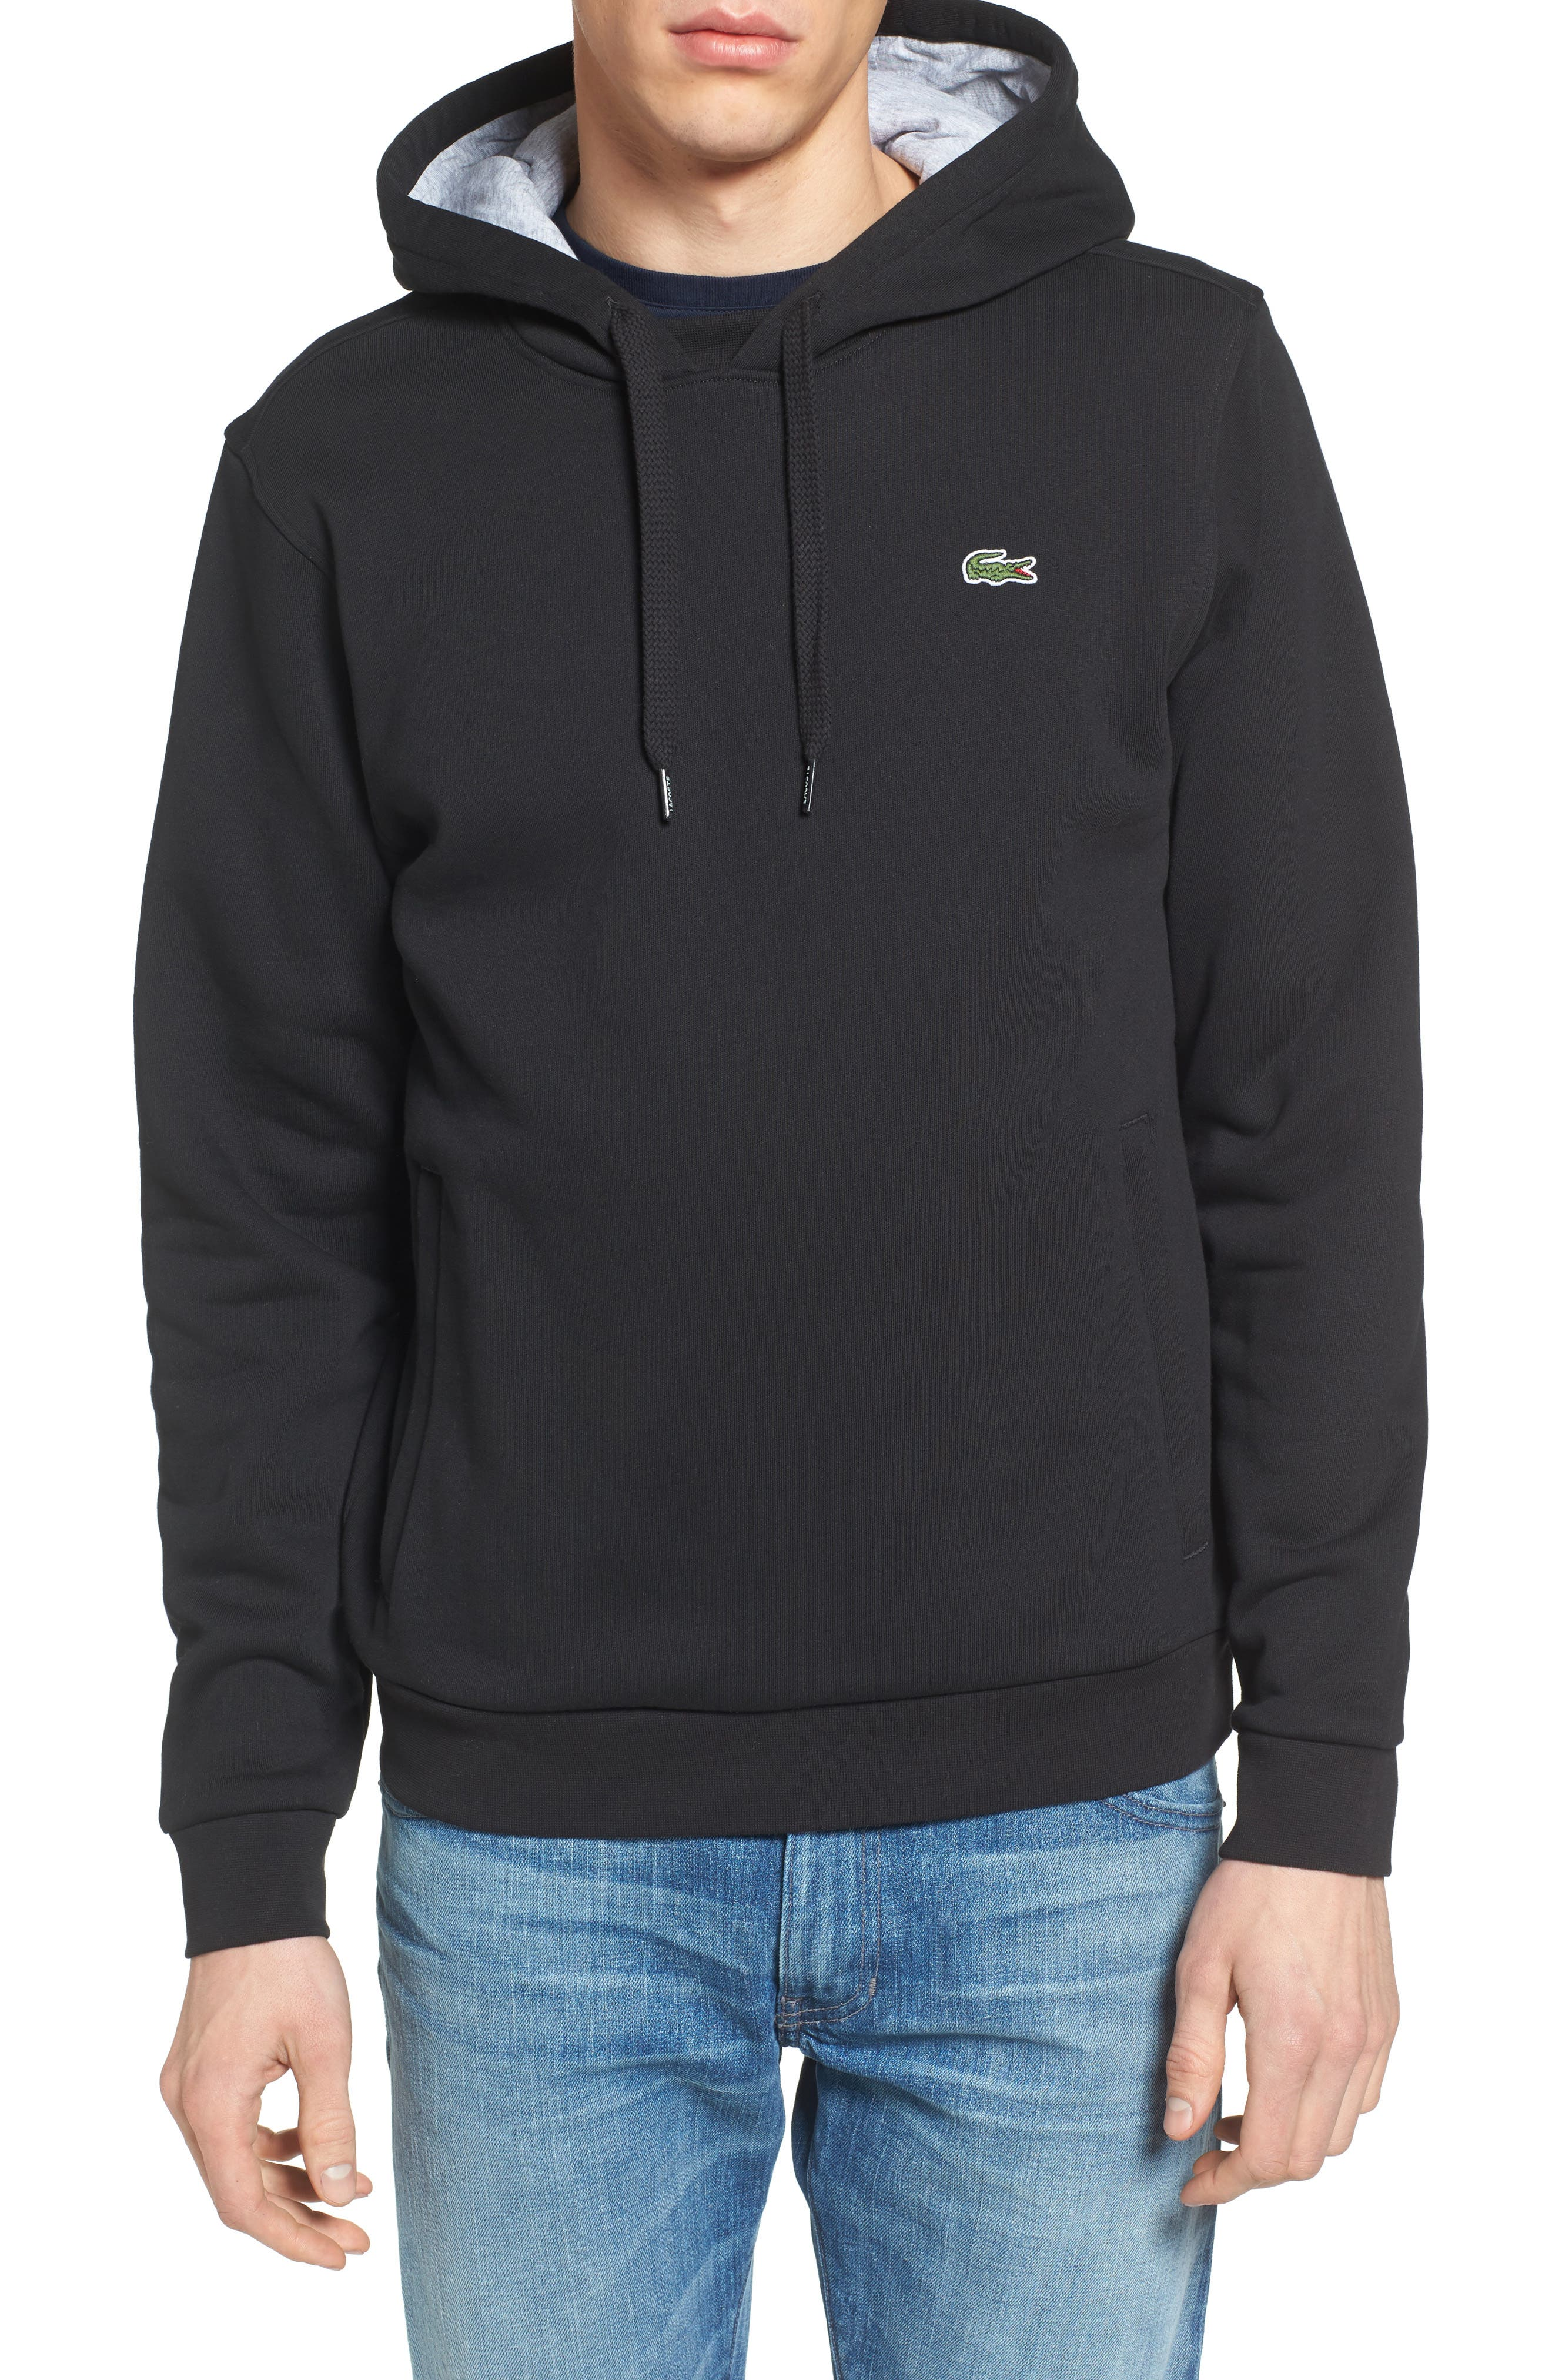 Sport Cotton Blend Hoodie,                         Main,                         color, BLACK/ SILVER CHINE